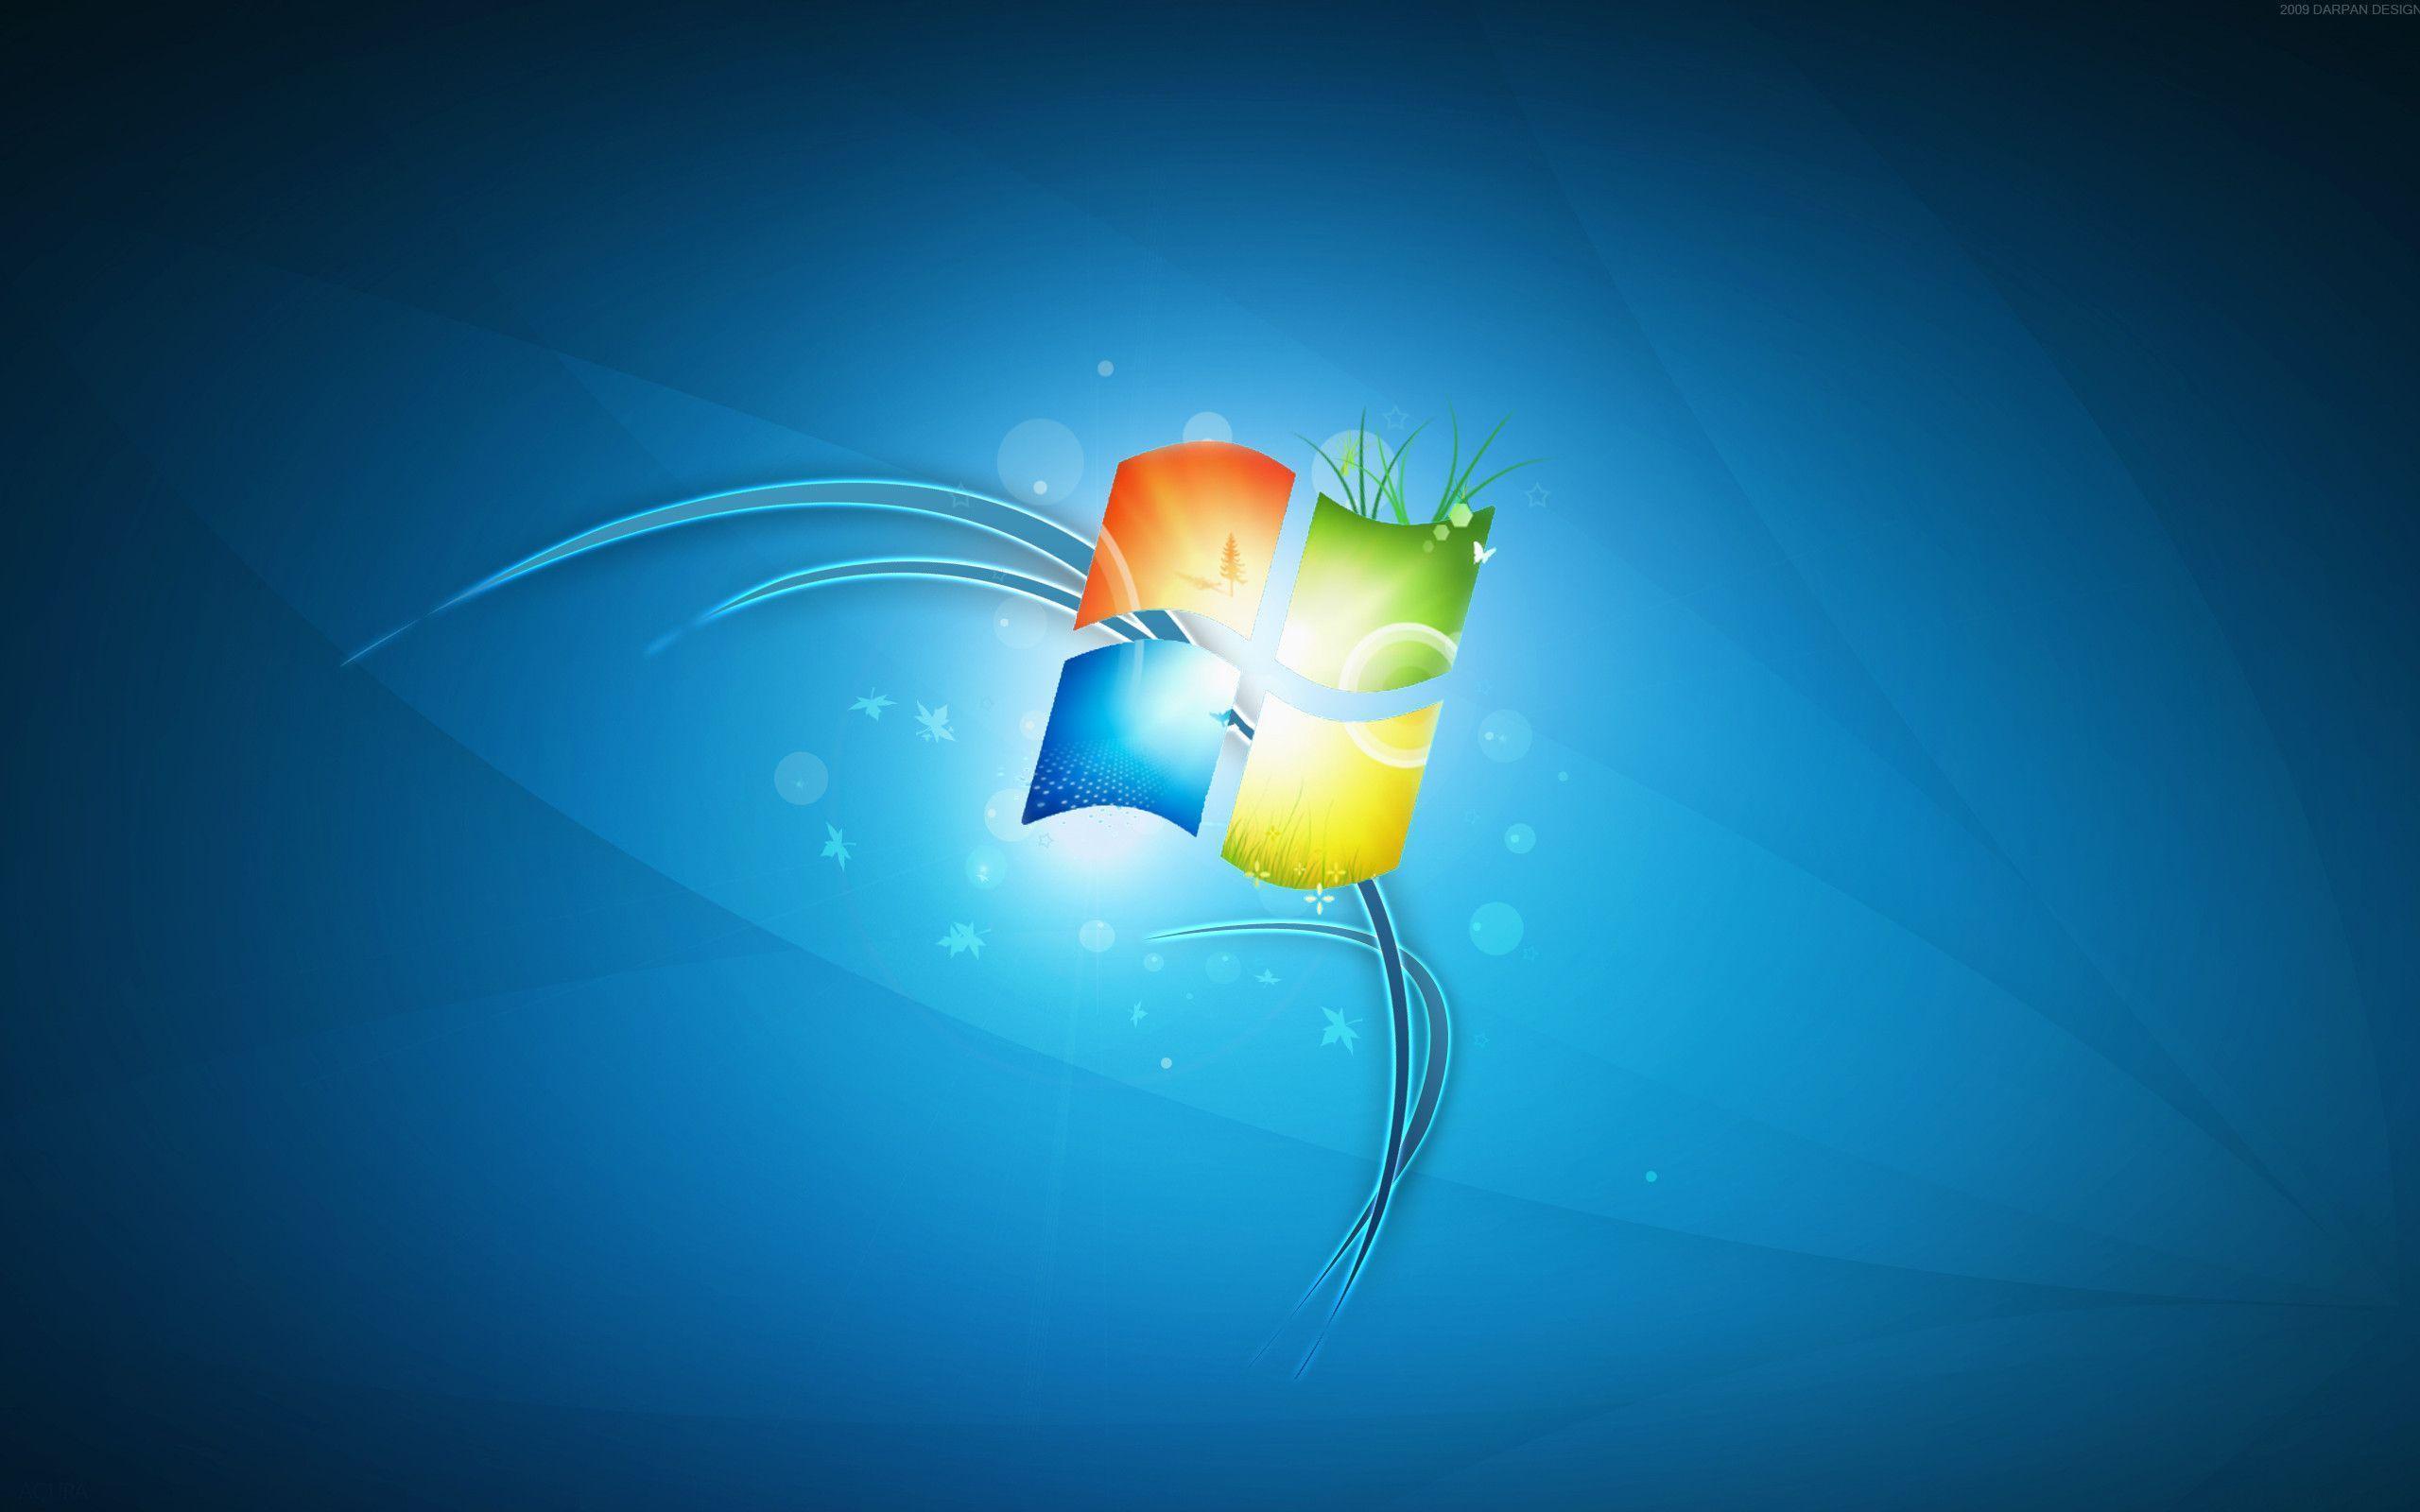 Download windows seven black 1024x768 wallpaper 1771 - Microsoft Windows 7 Wallpaper Desktop Backgrounds Www